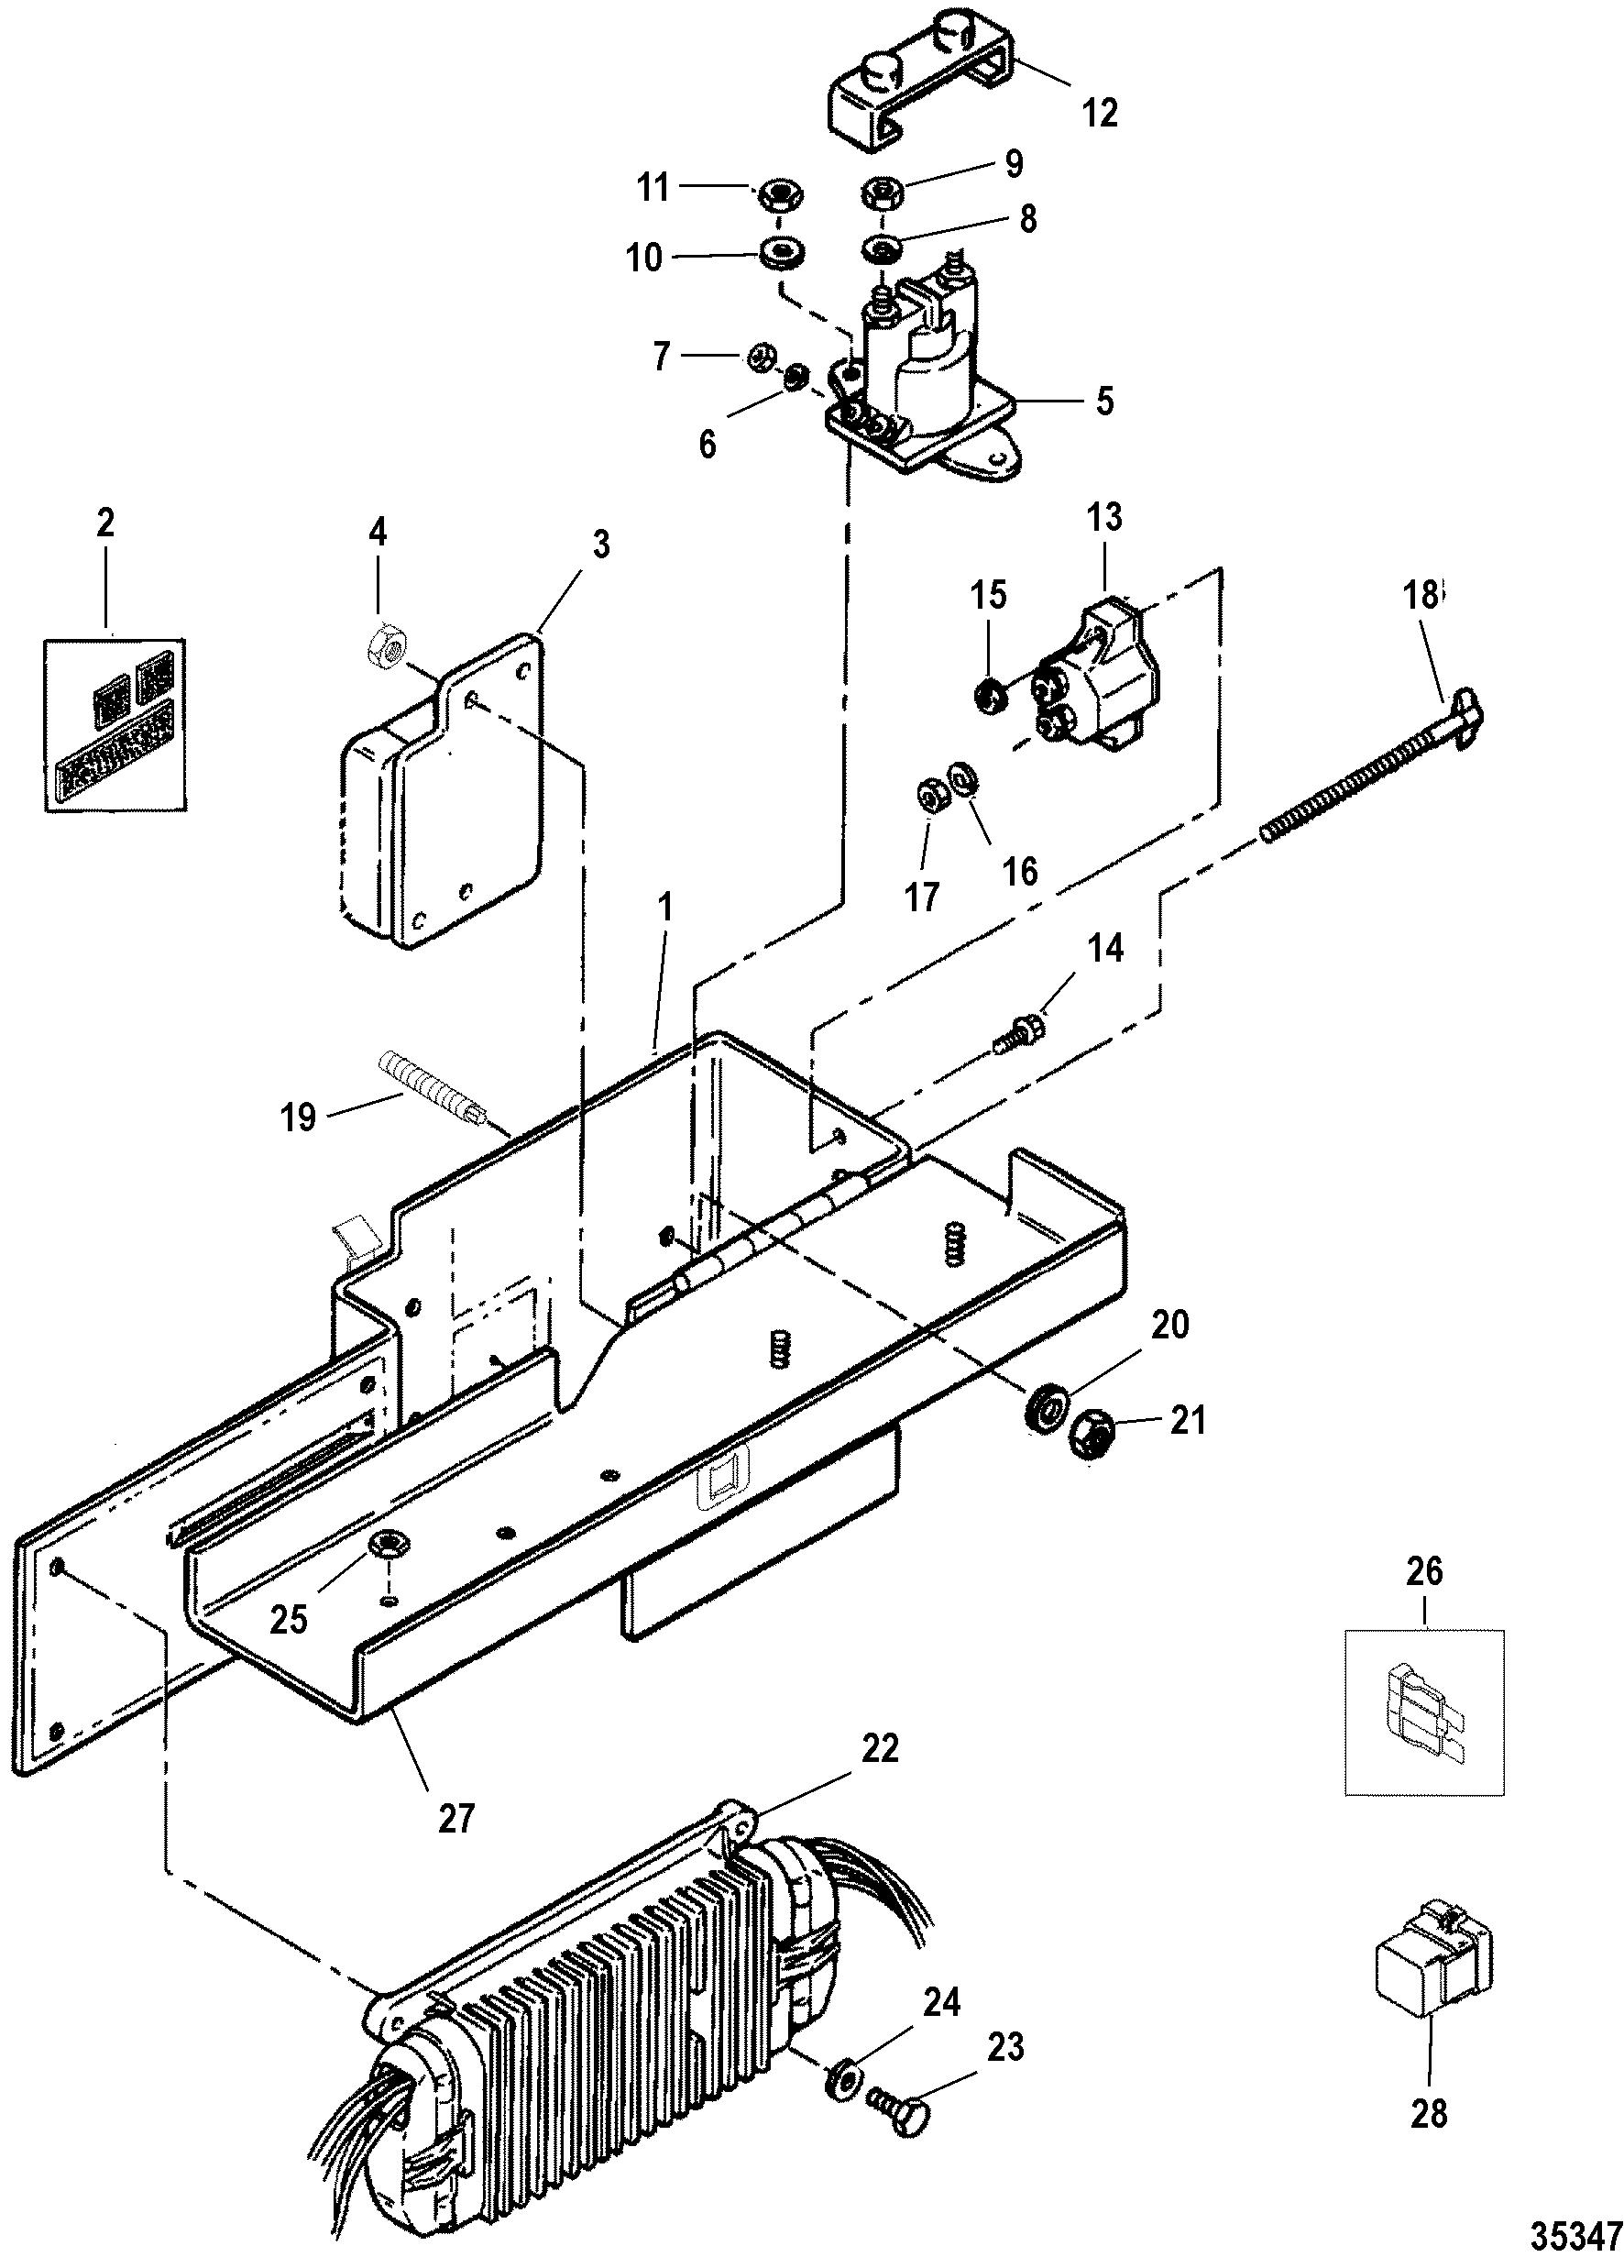 mercruiser 8 2l mie mpi gen vi gm 502 Mercruiser 5.7 Wiring Harness Diagram electrical box and ponents